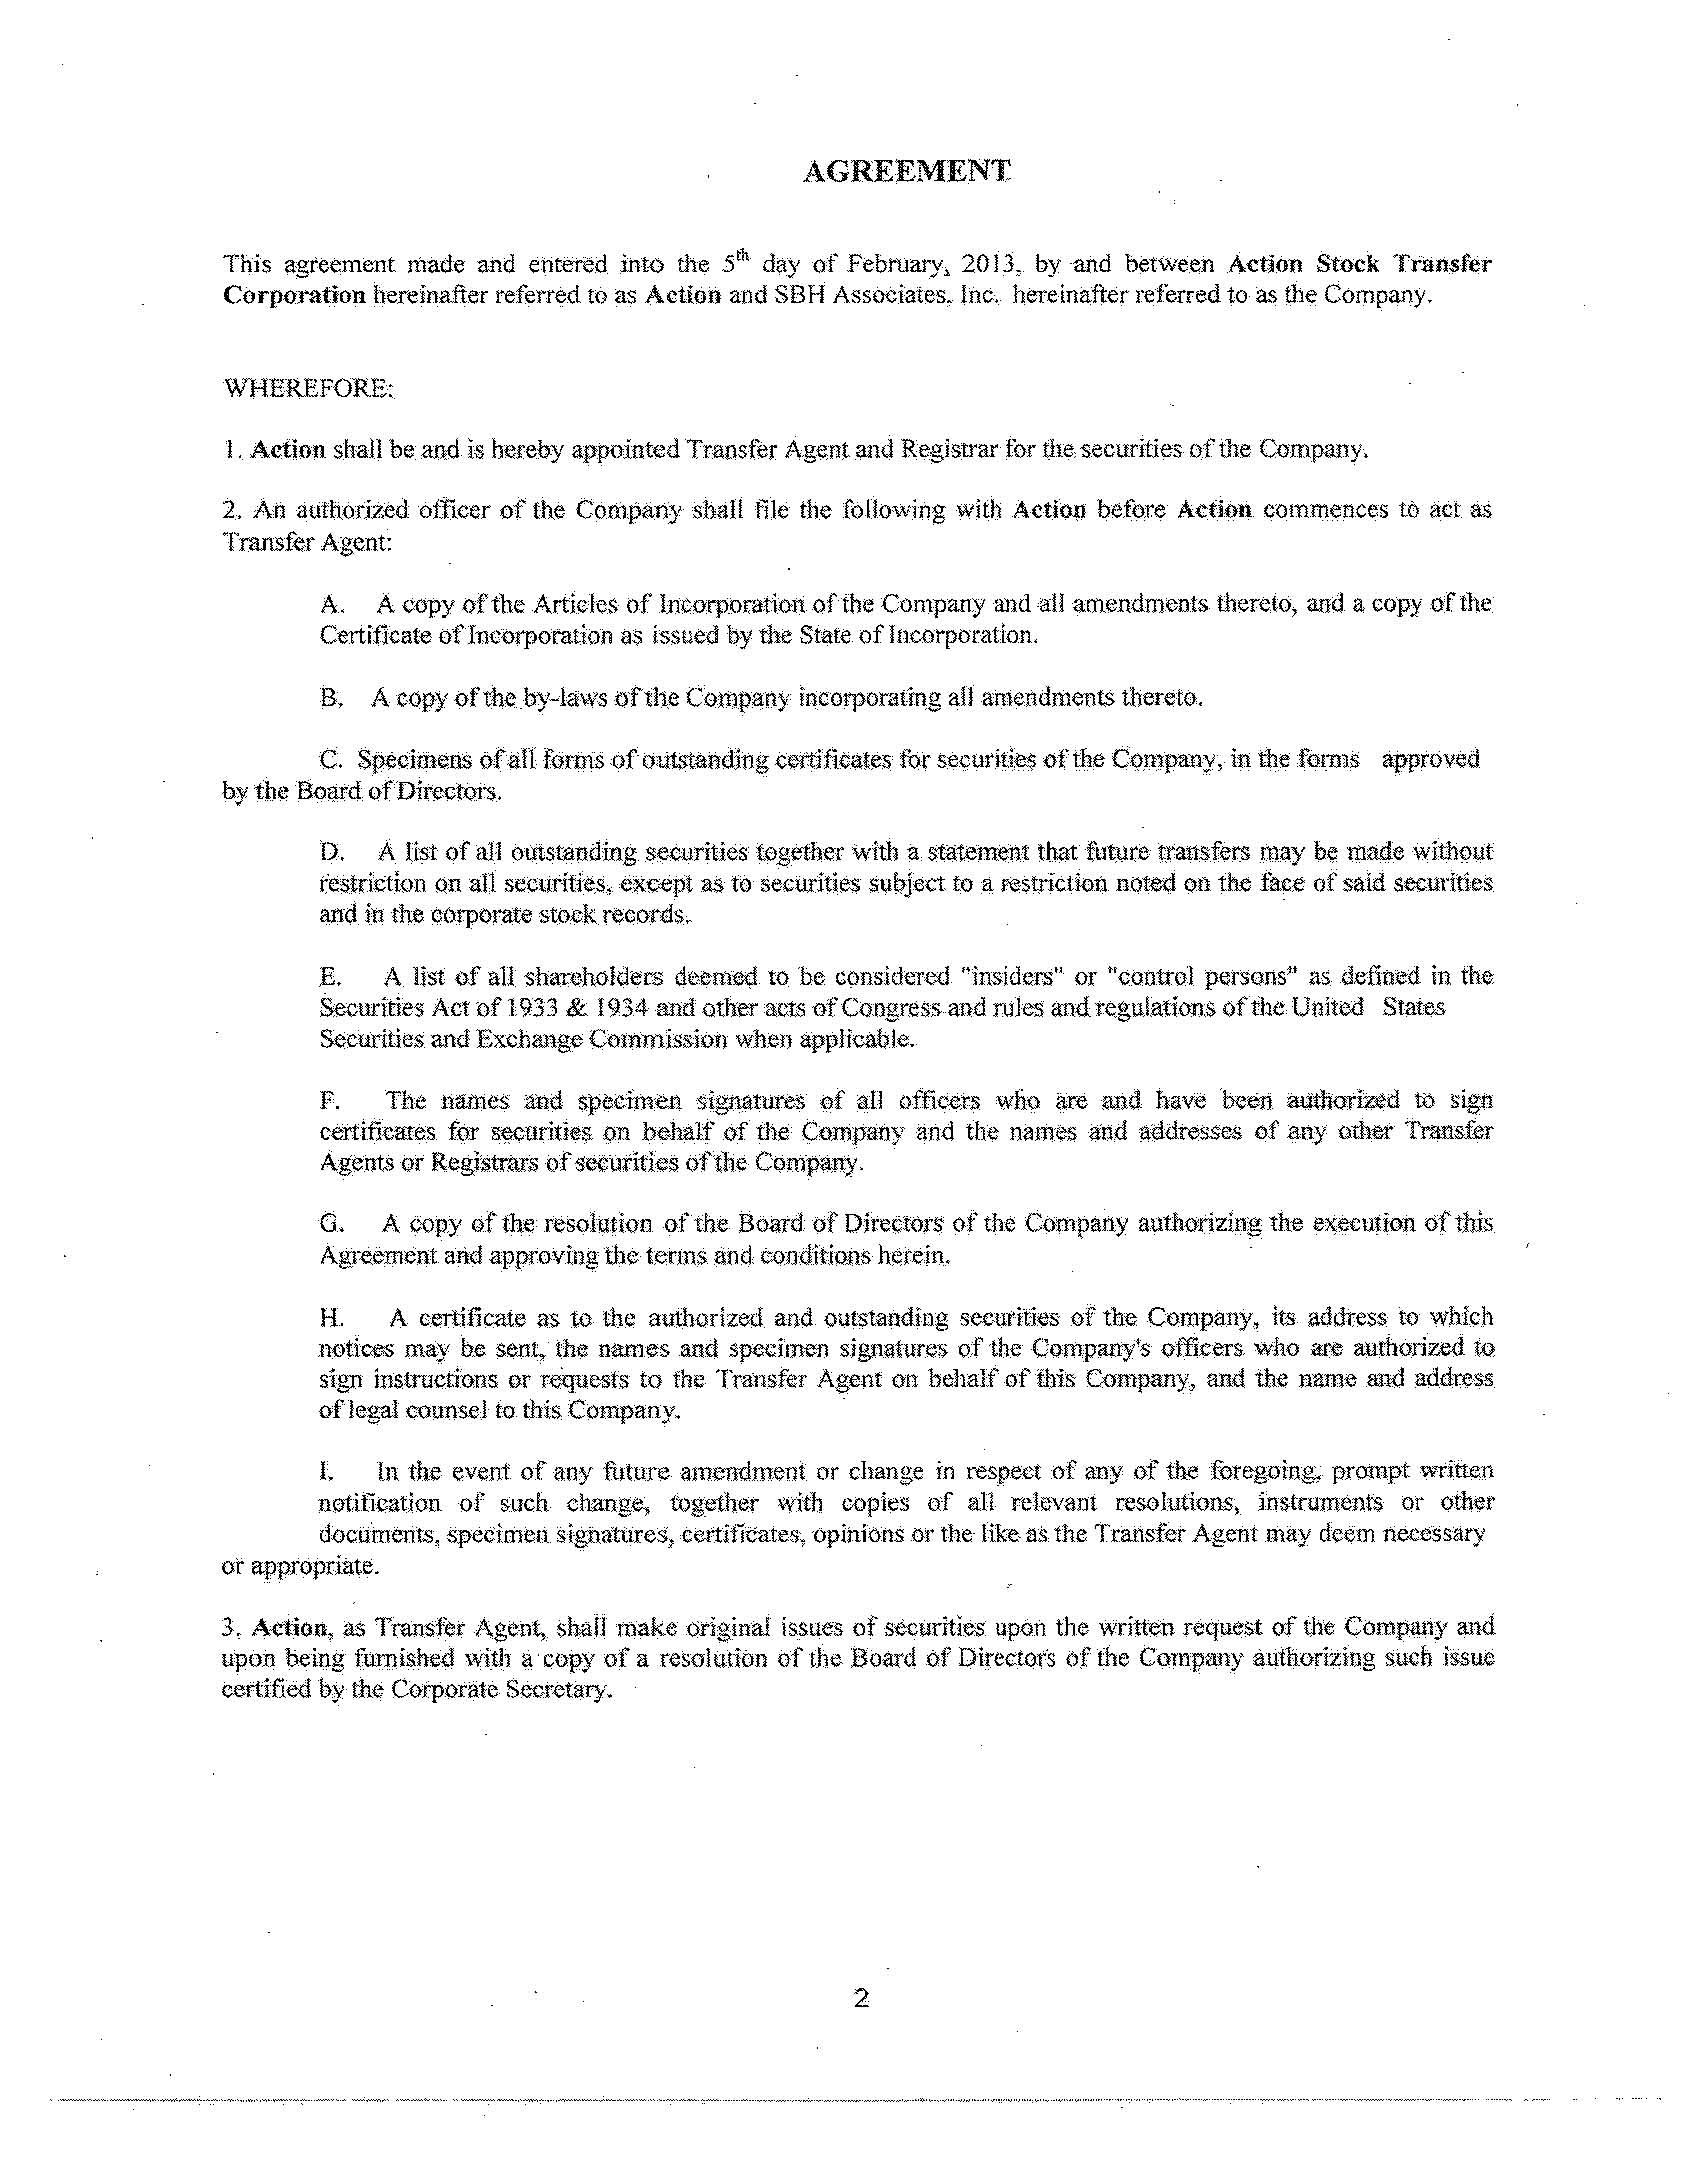 Sbh Associates Inc Form S 1a Ex 992 Exhibit 992 Agreement